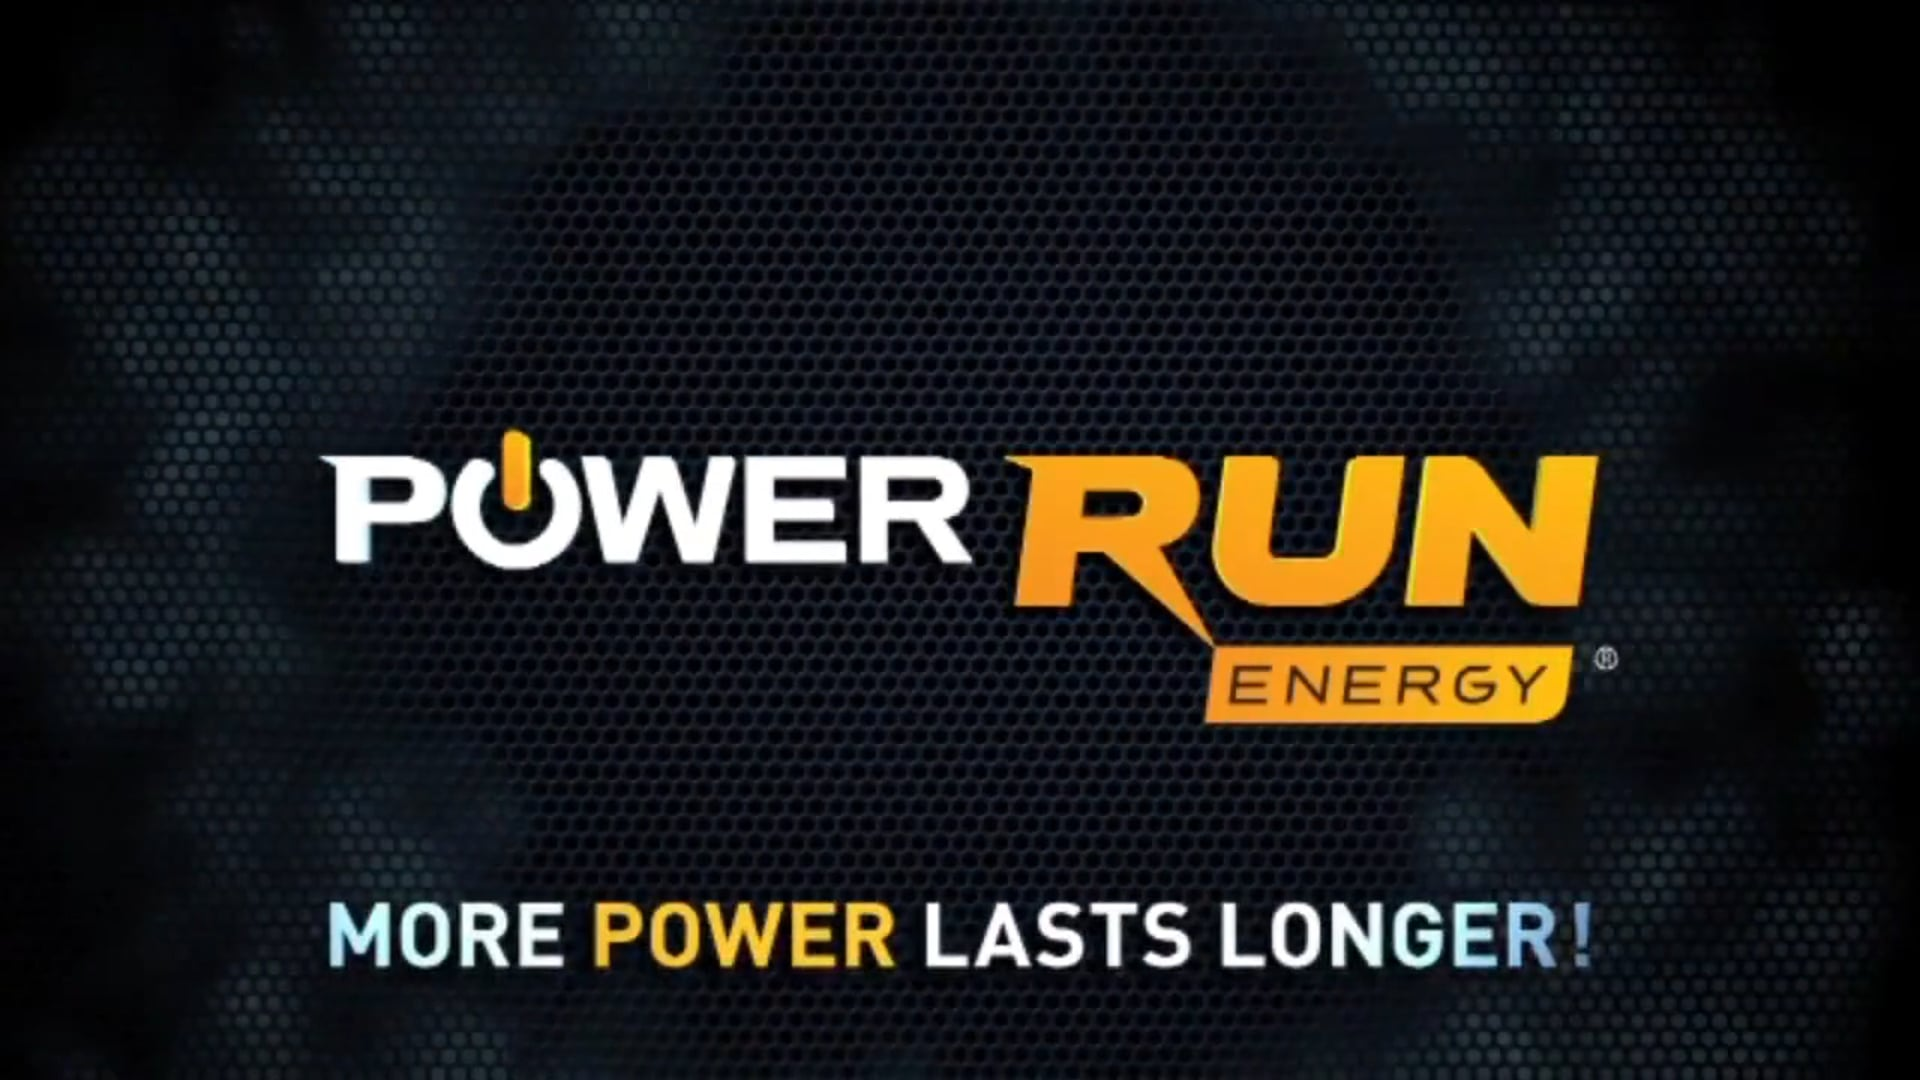 Power Run Energy